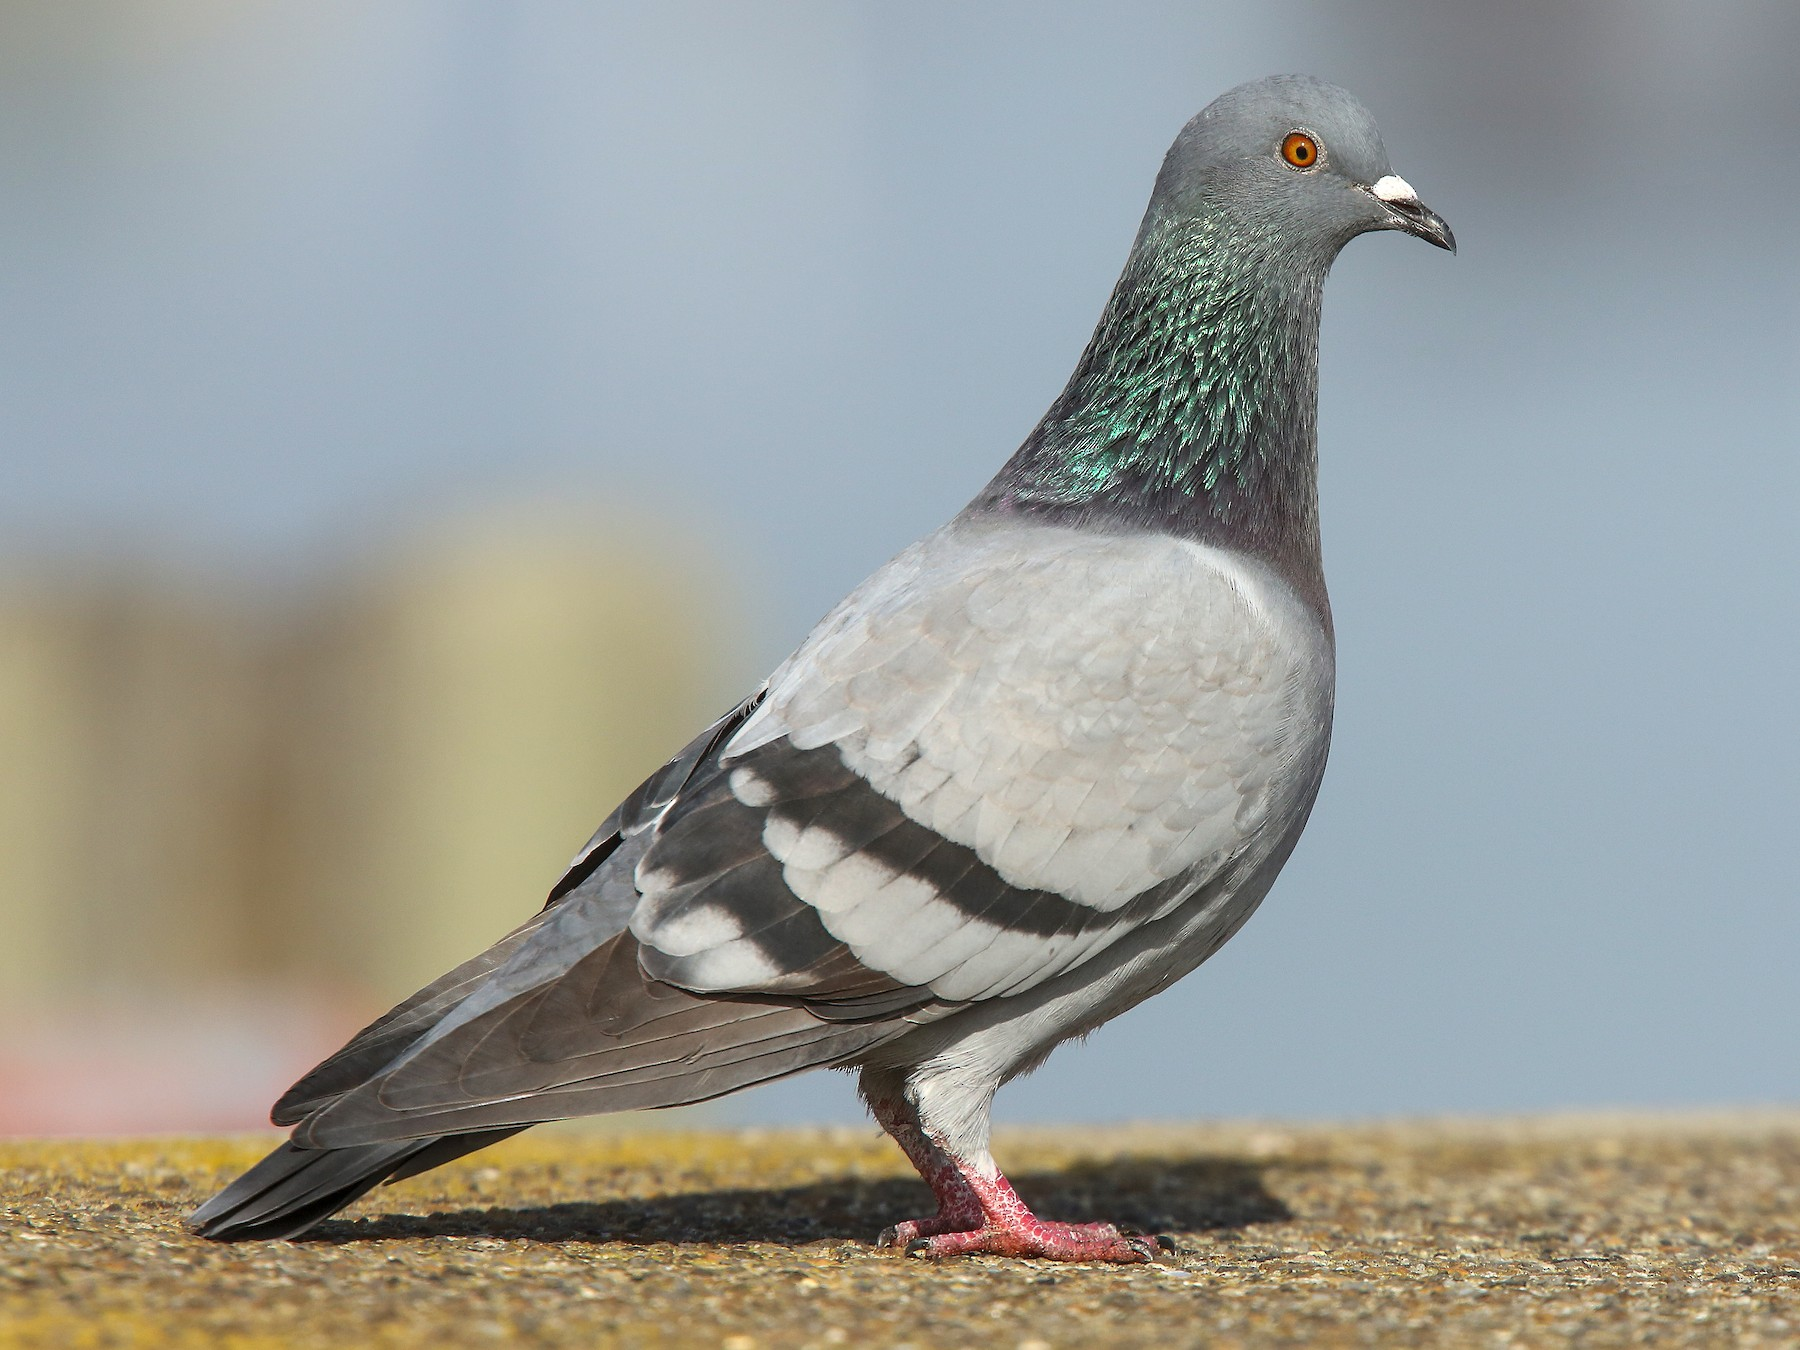 Rock Pigeon - Luke Seitz